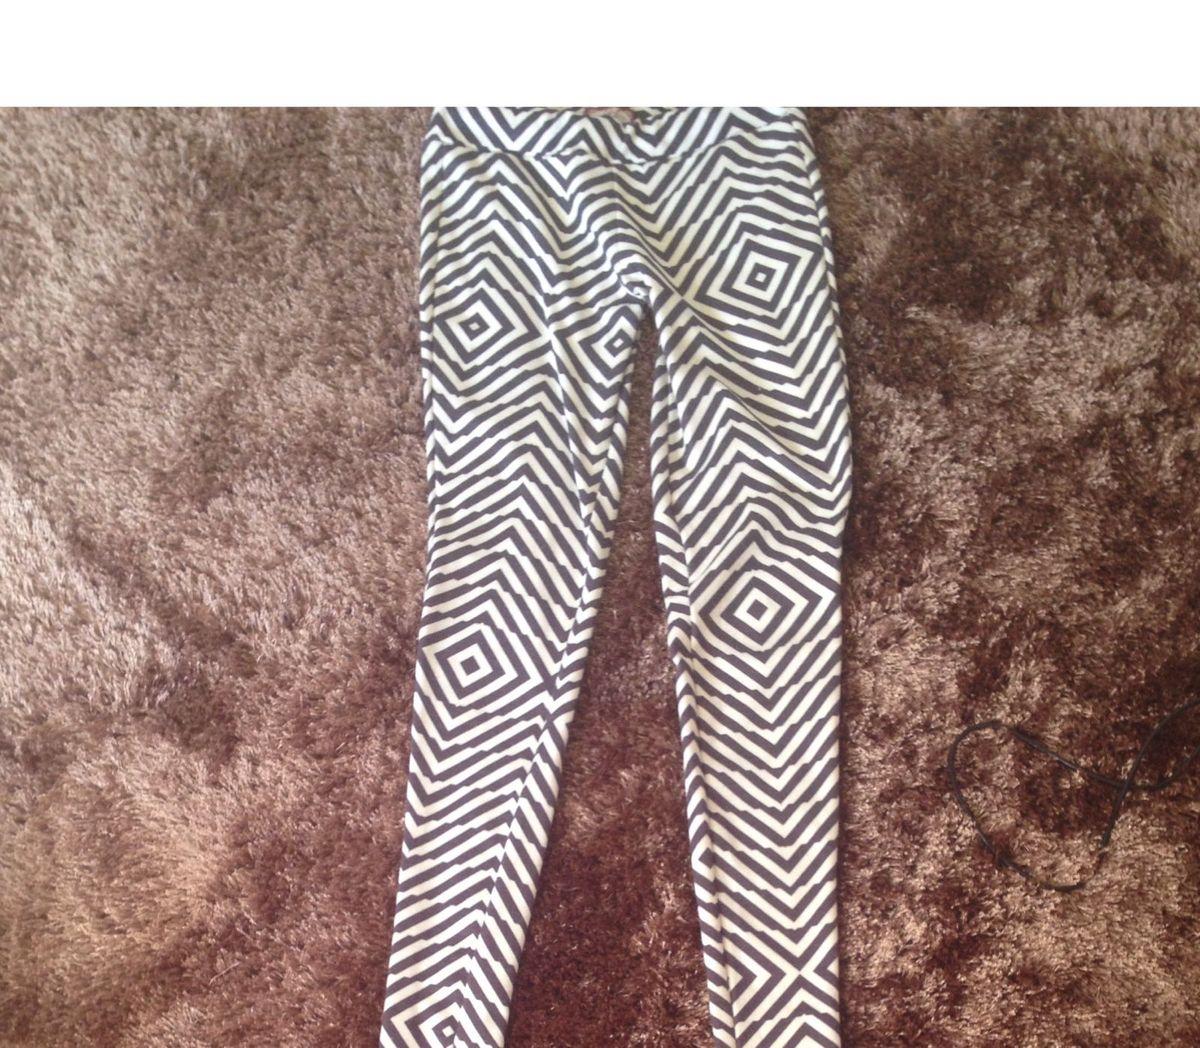 aab4c6c09de legging estampada khelf - calças khelf.  Czm6ly9wag90b3muzw5qb2vplmnvbs5ici9wcm9kdwn0cy80njk4ntaxlzrjoweymta0mwe5owrmotkwogm4mgnln2m5ndbjnzlllmpwzw  ...